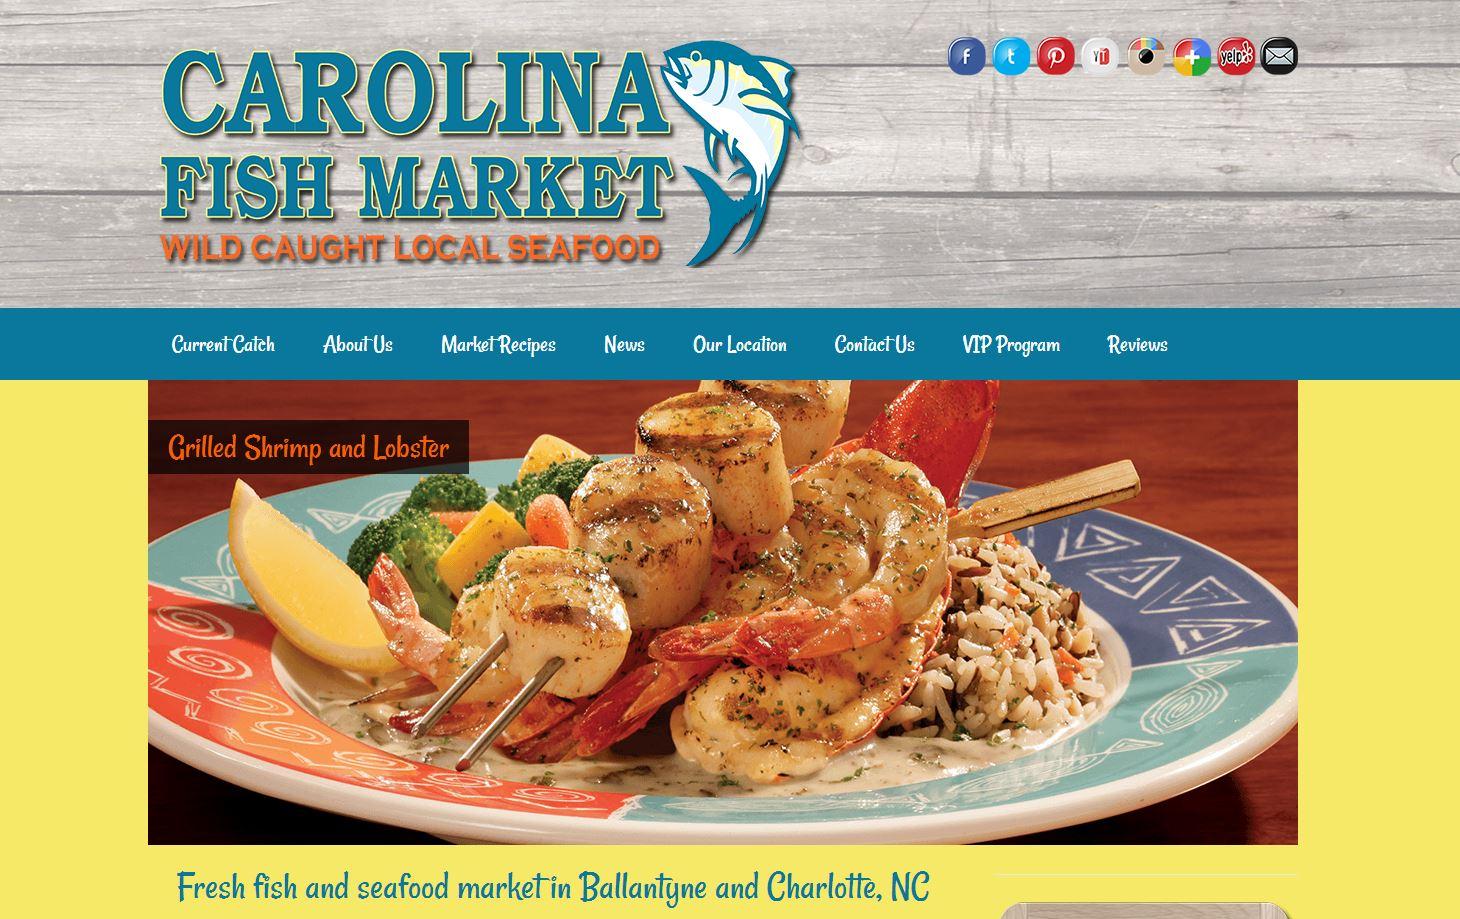 Carolina fish market website design firepoint media for Fish market charlotte nc